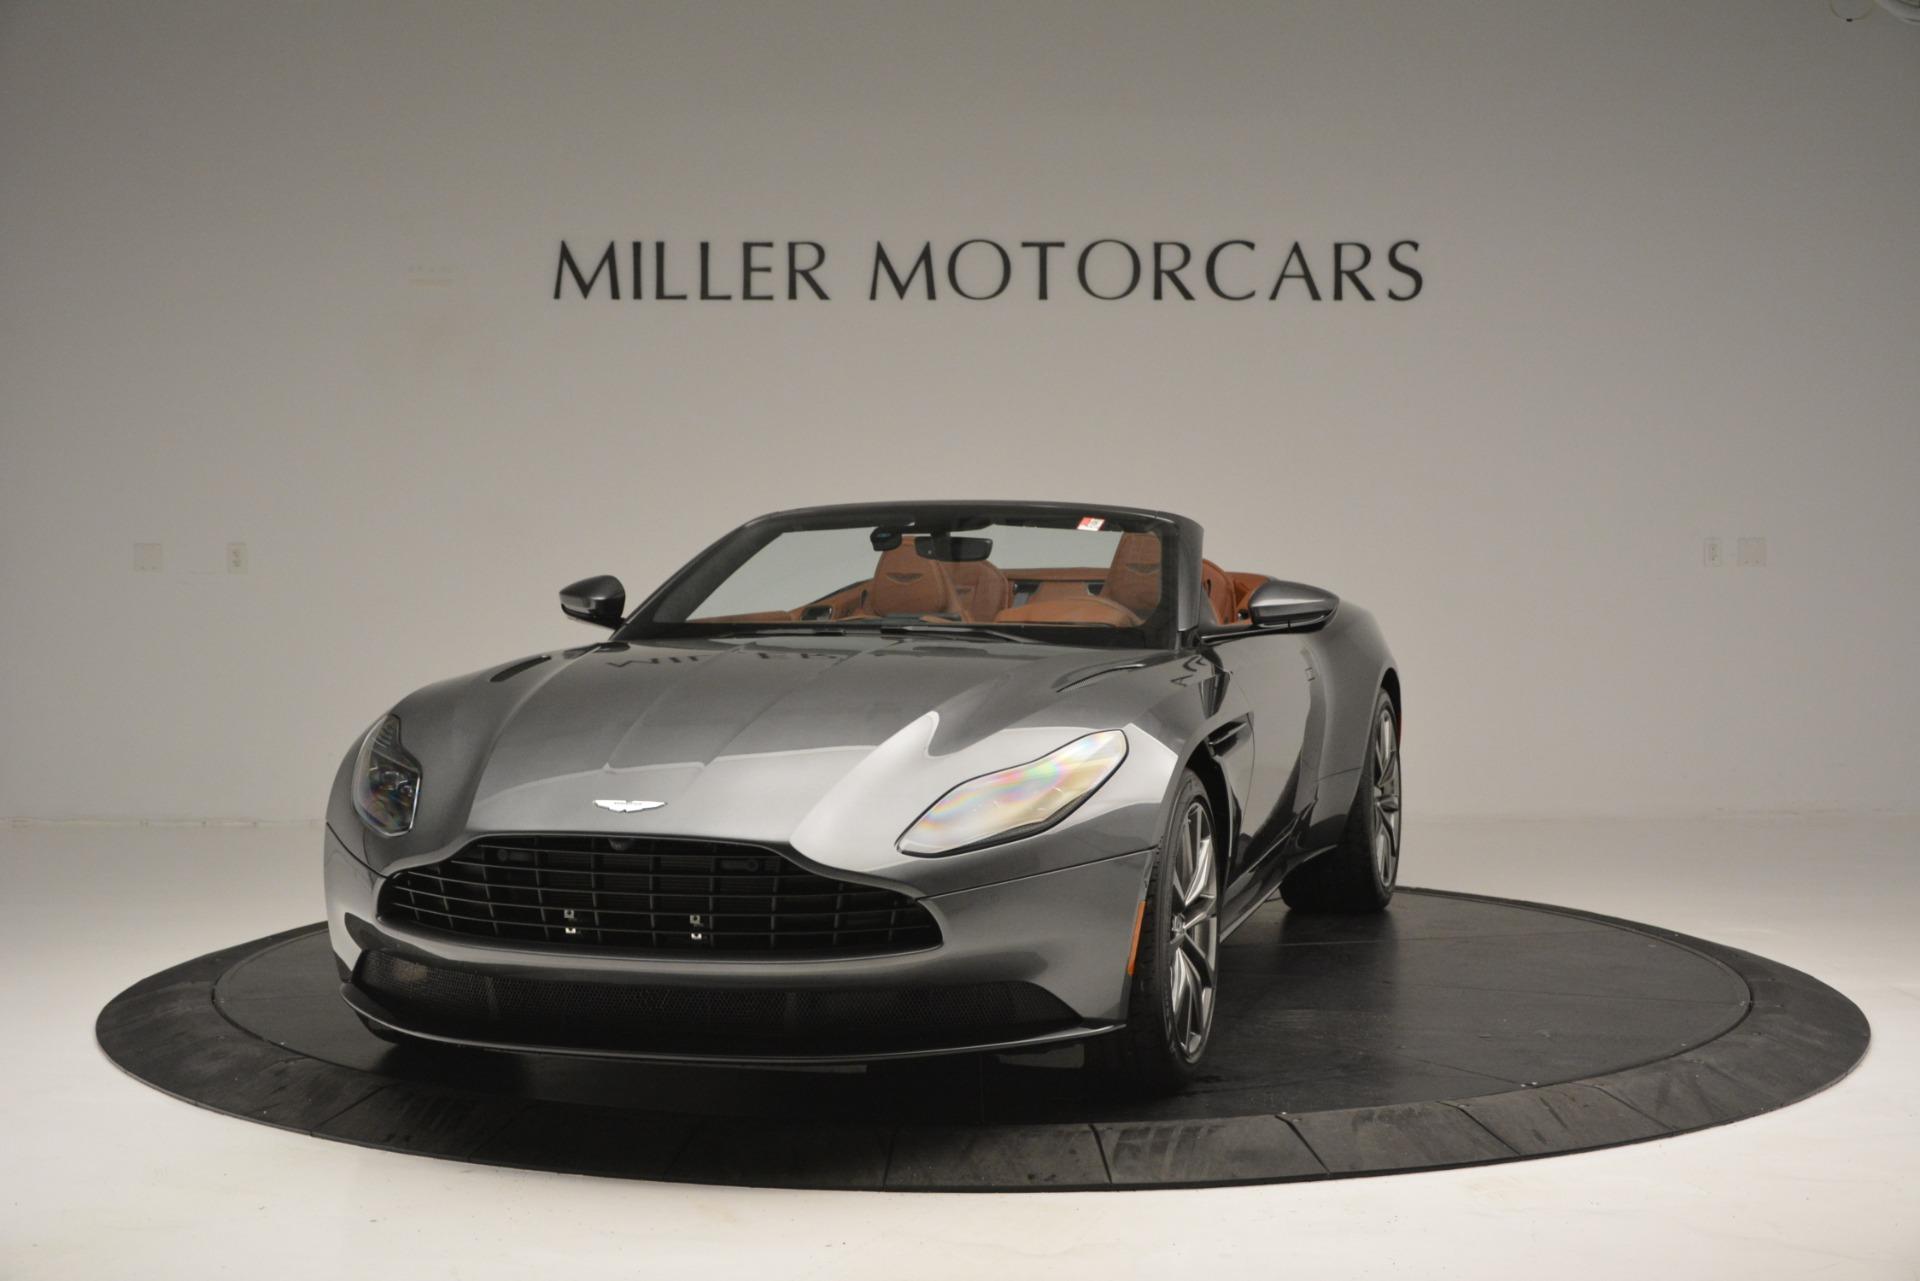 Aston Martin Lease Specials Miller Motorcars New Aston Martin